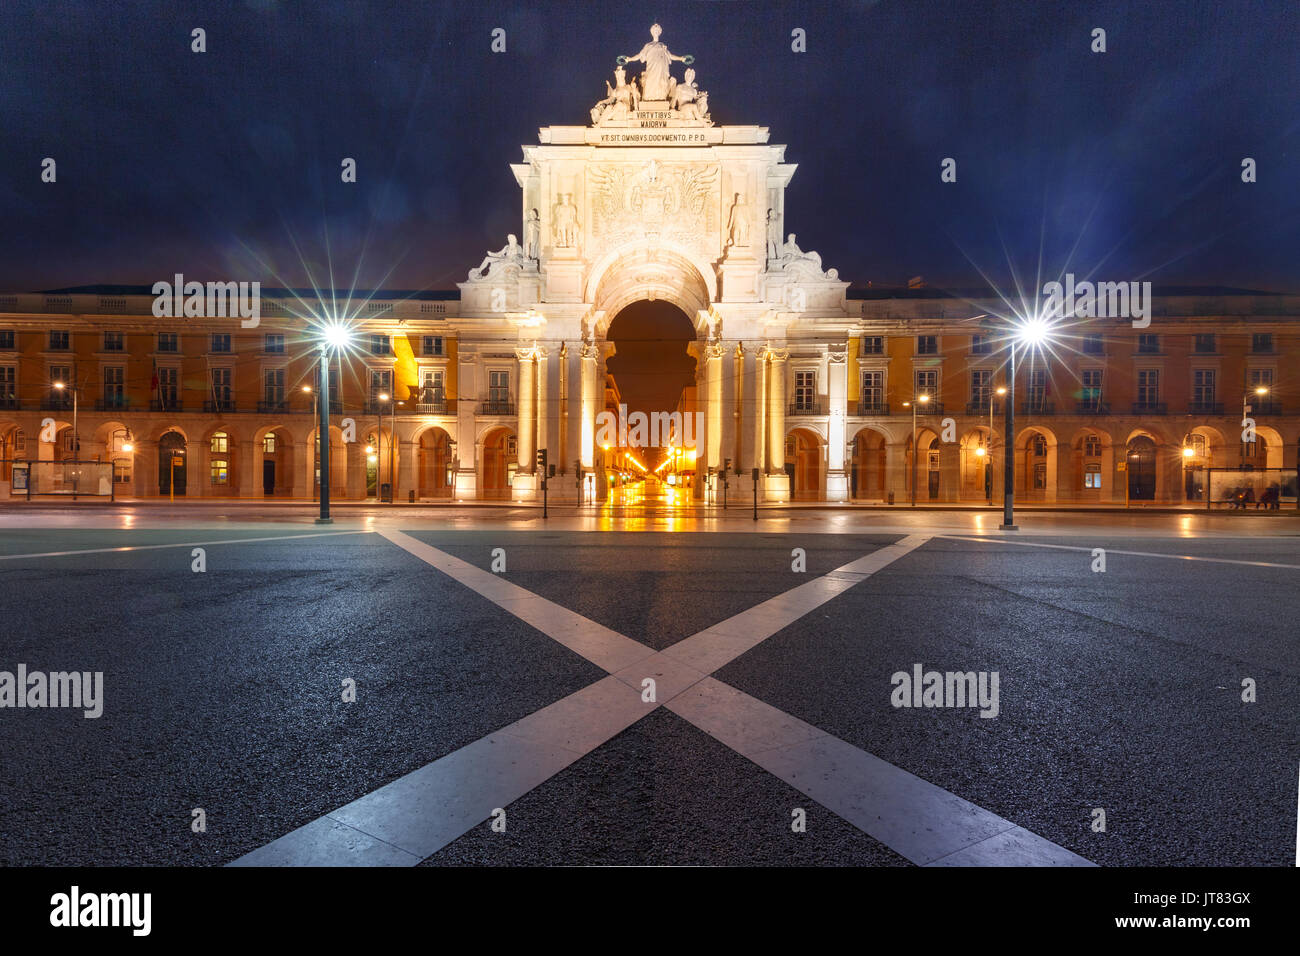 Commerce Square en la noche en Lisboa, Portugal. Foto de stock